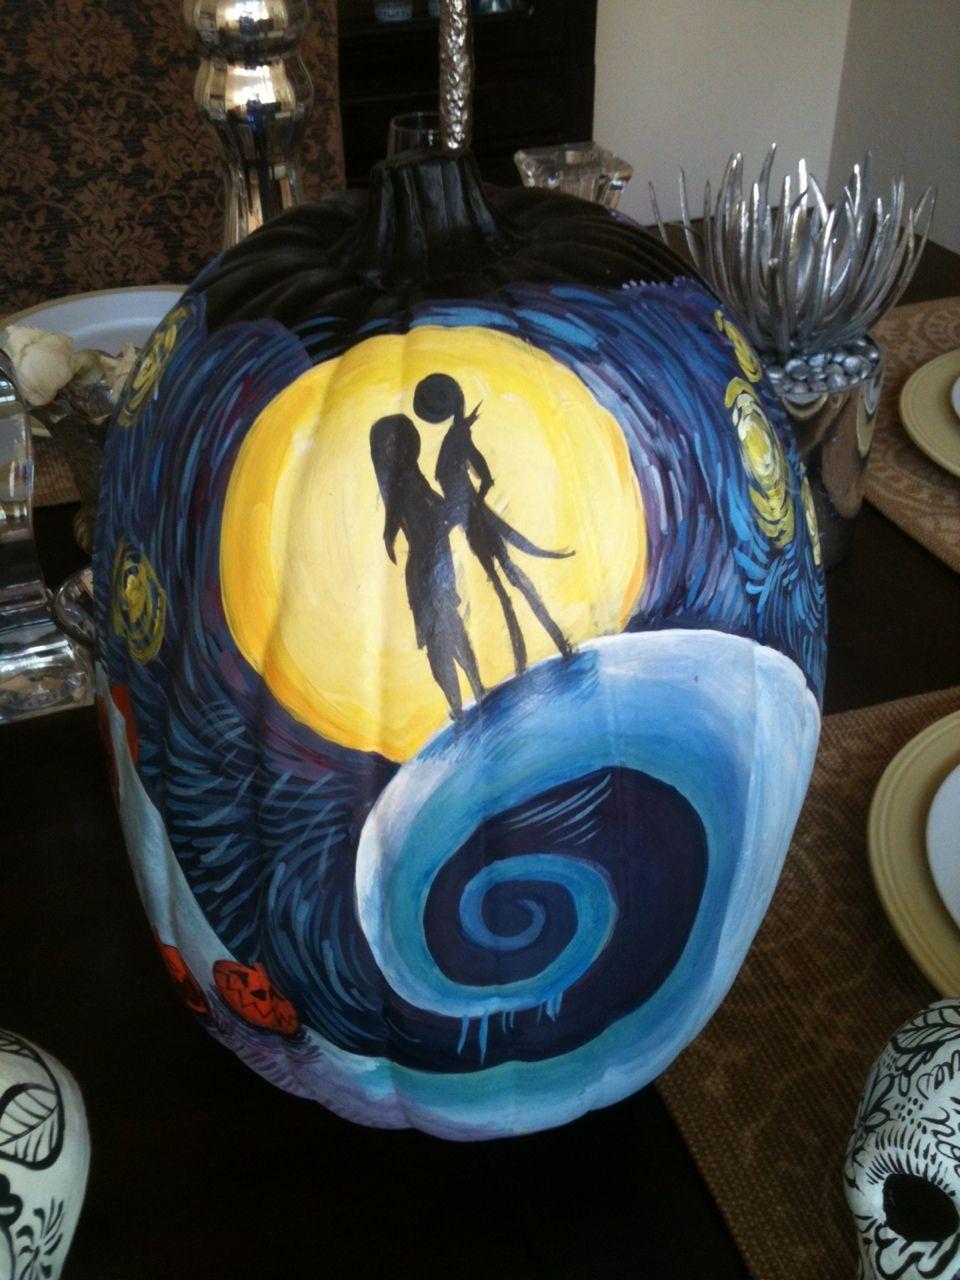 Pin by Brandi Johner on Pumpkin Paint Ideas | Pinterest | Christmas ...